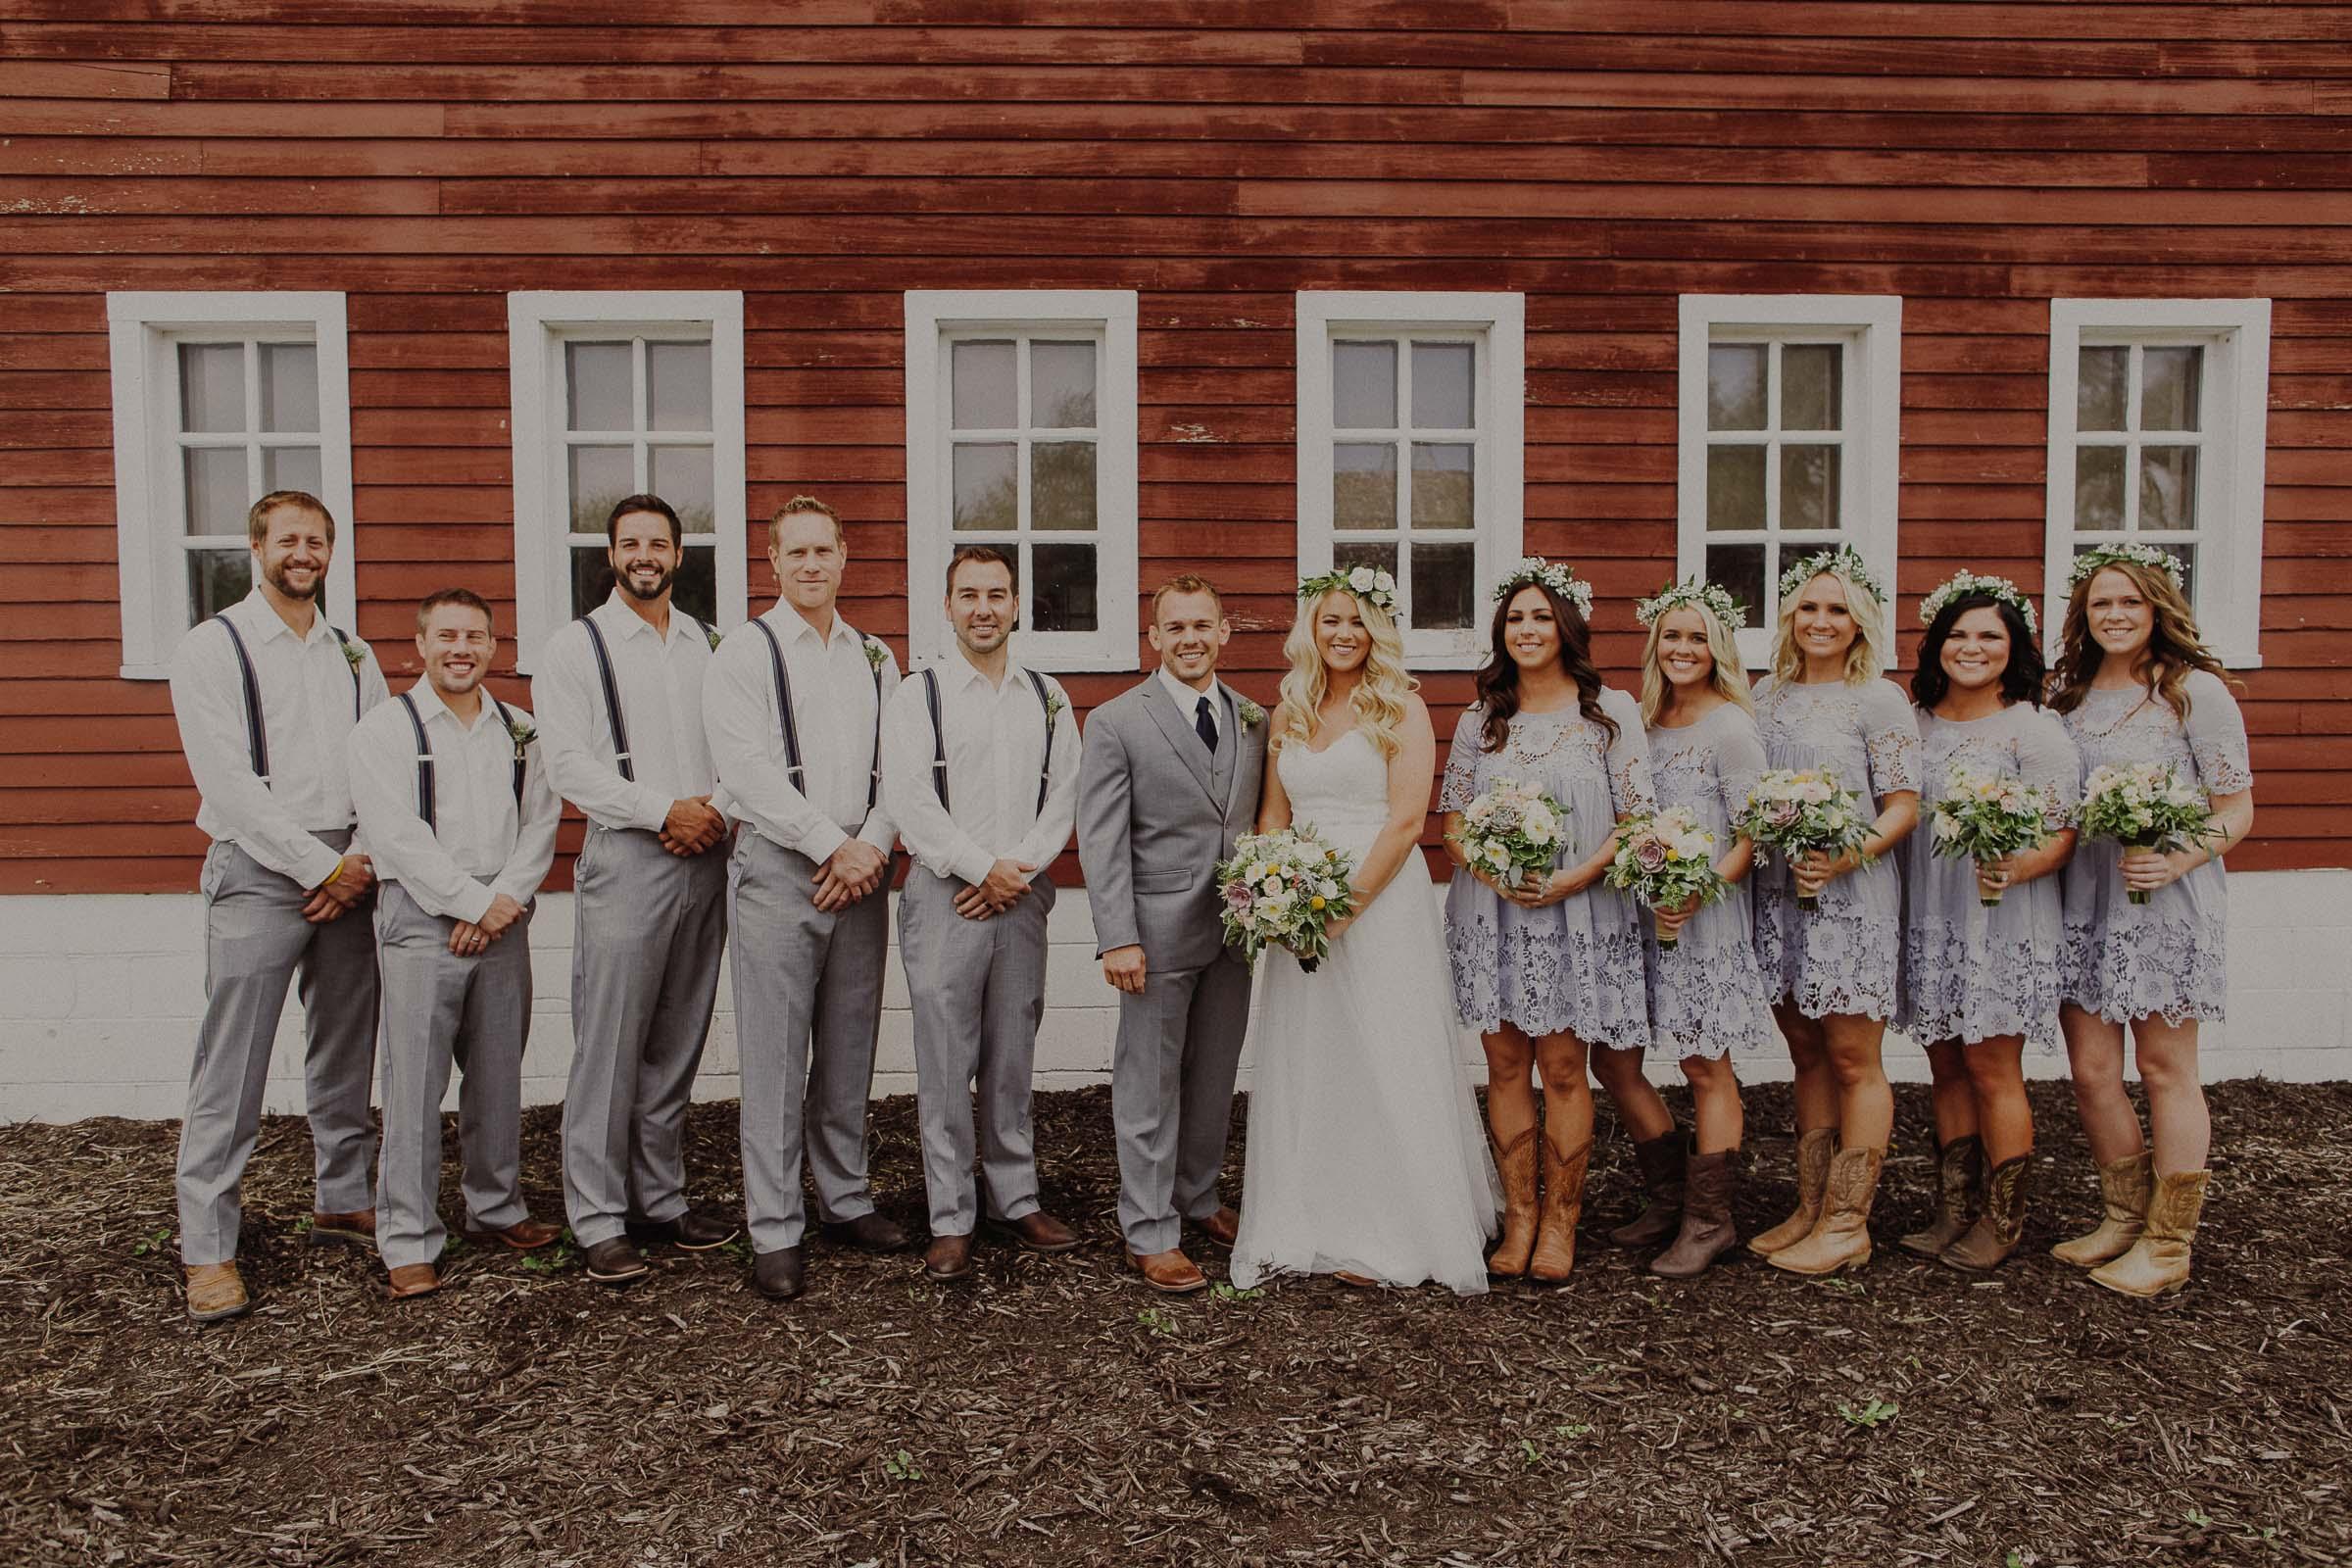 The Barn at the Ackerhurst Dairy Farm wedding